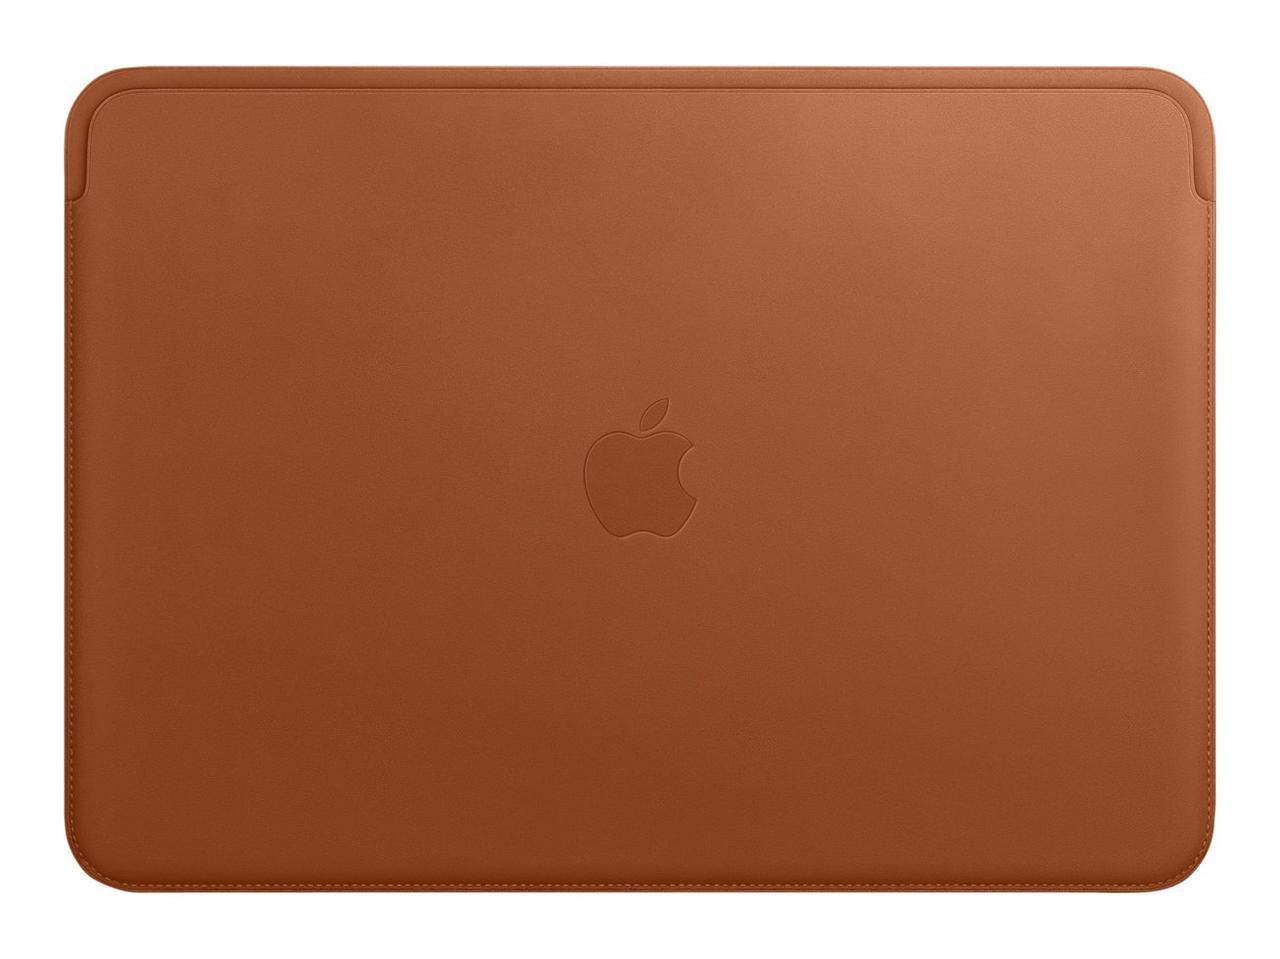 "Чехол для MacBook 13"" Apple Leather Sleeve, коричневый (MRQM2ZM/A)"